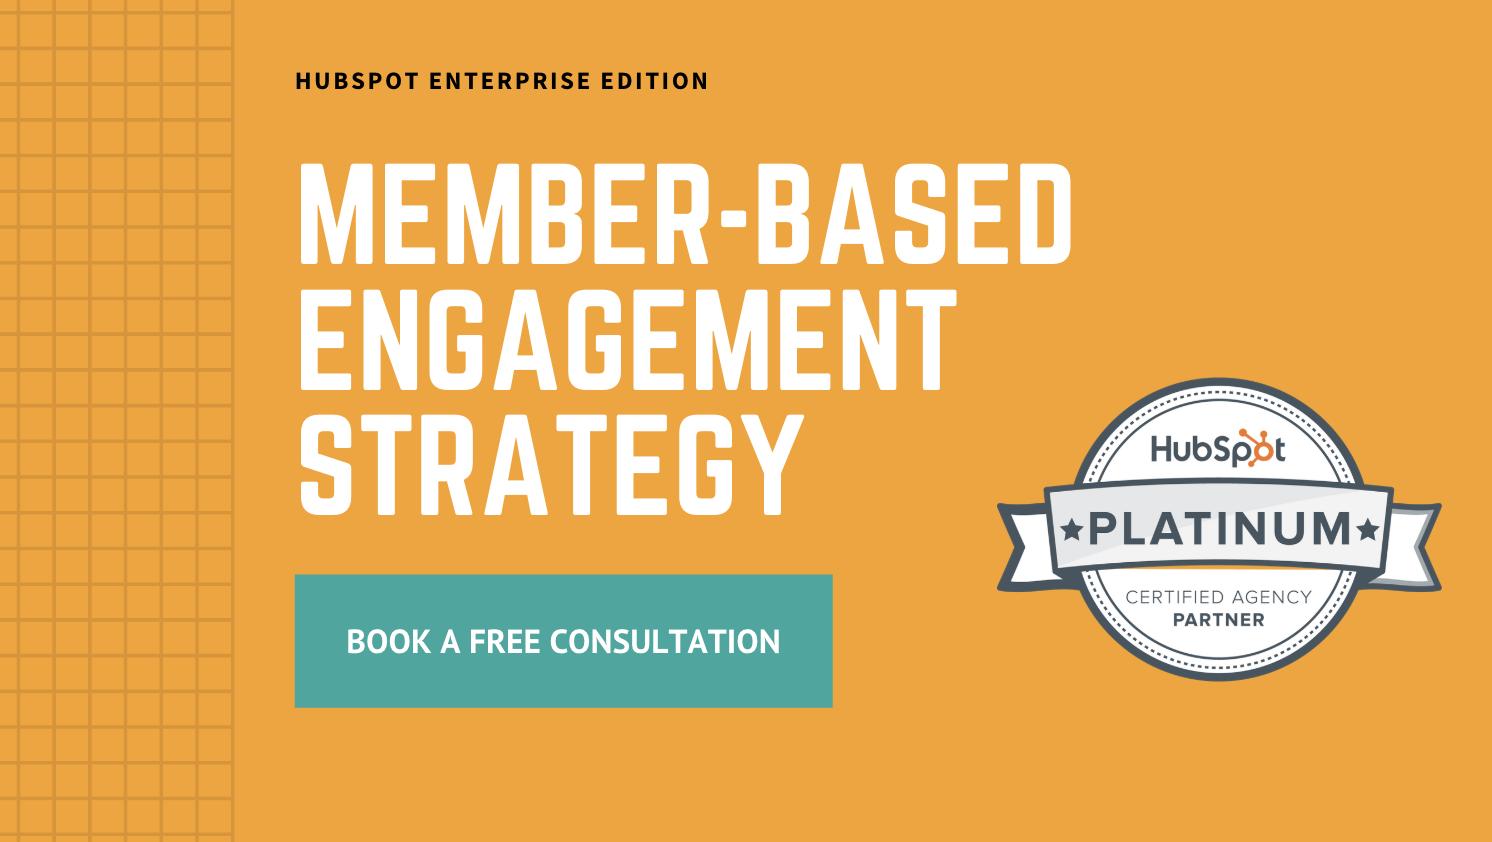 membership-strategy-hubspot